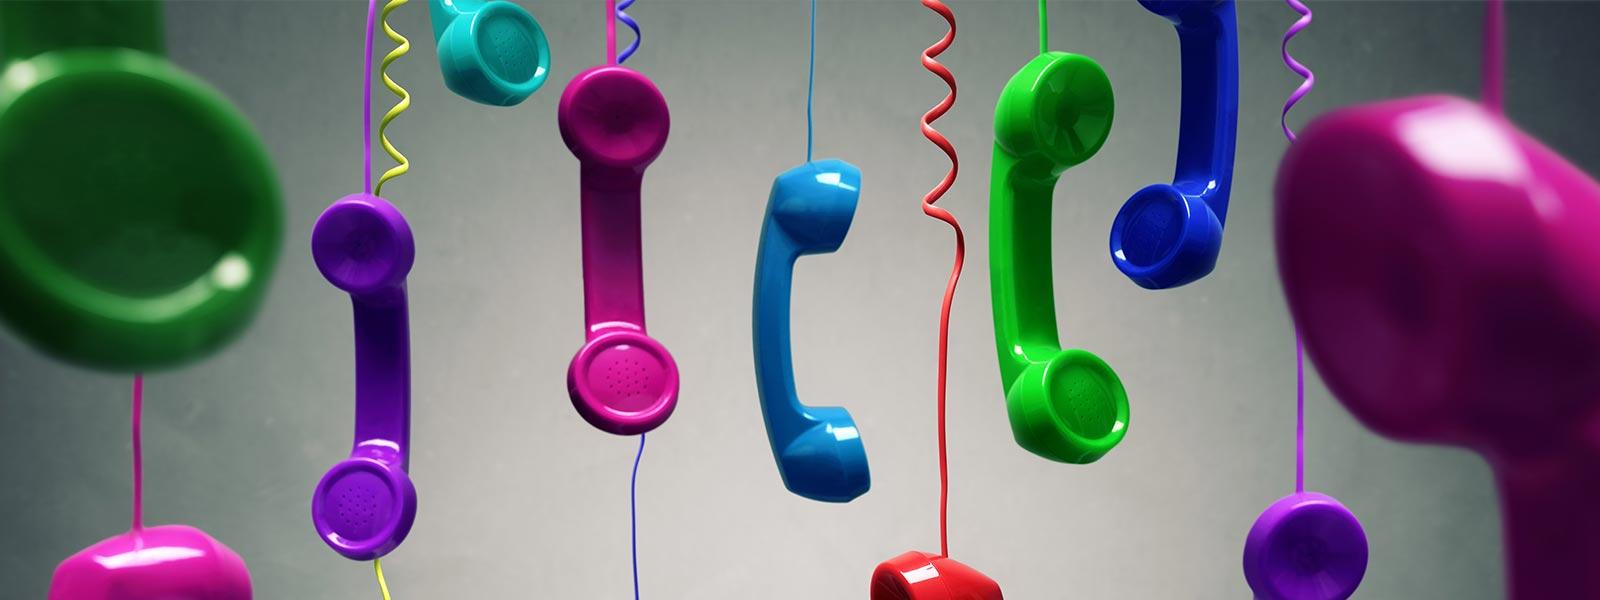 Telefonanfrage Hüpfburg mieten